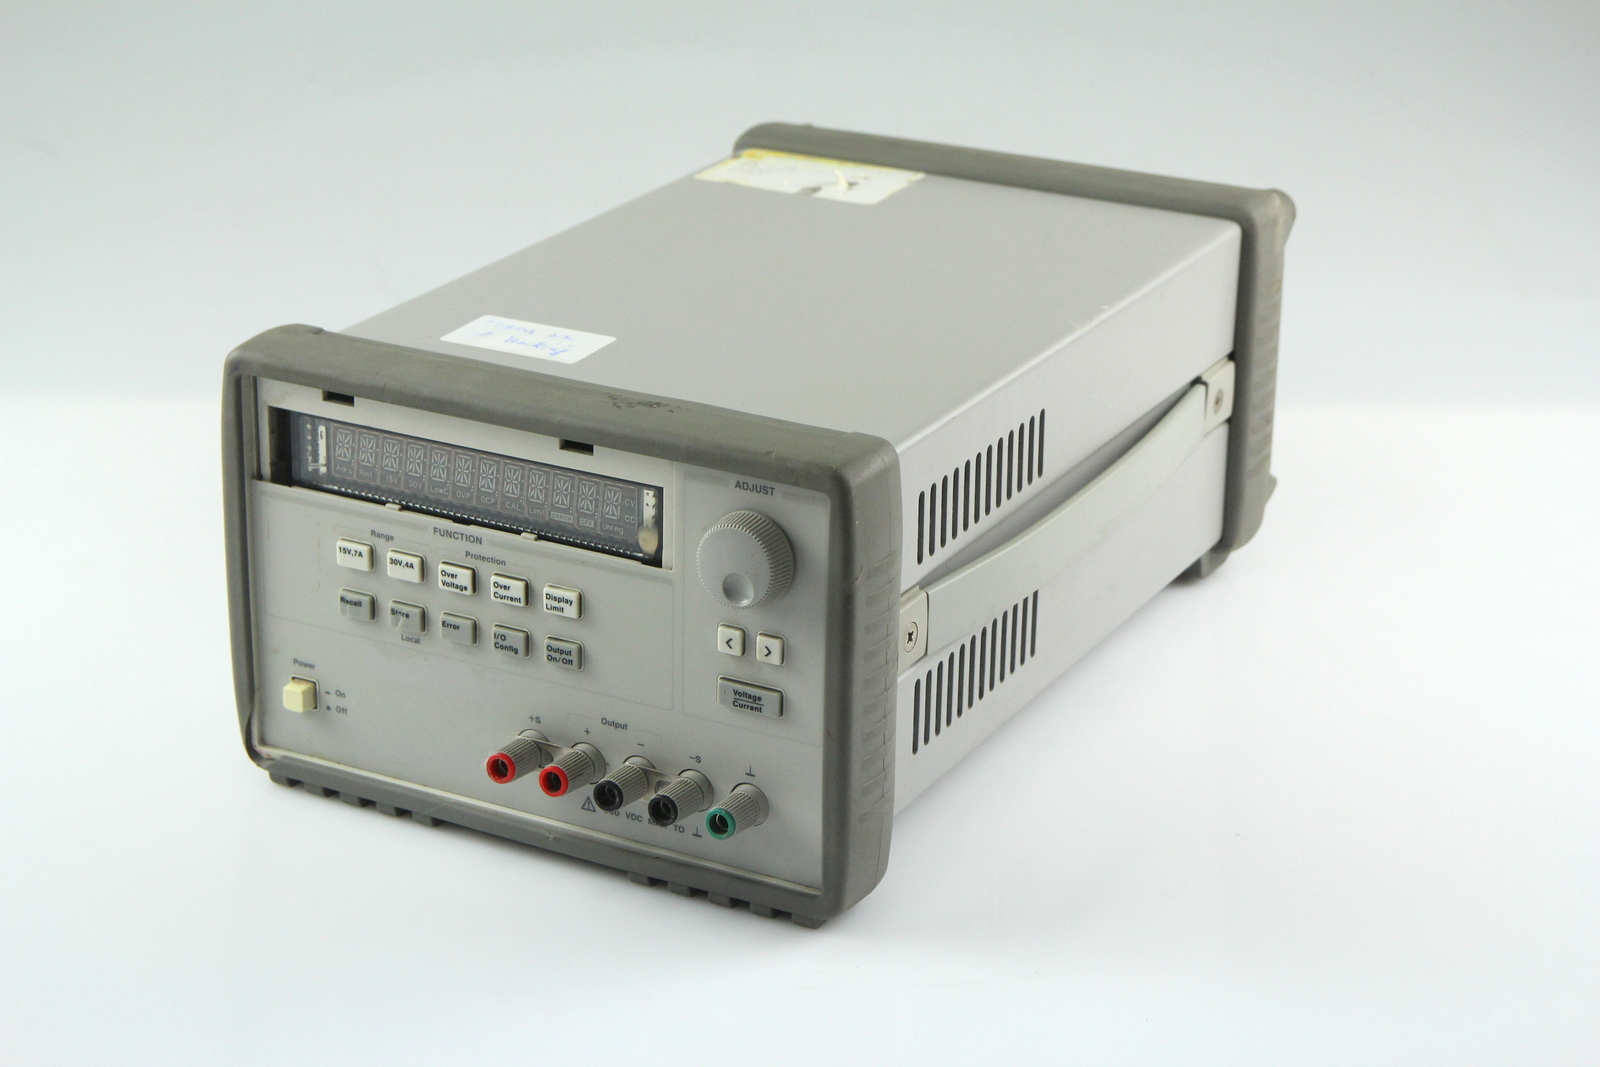 m10-380t-303c dc power supply manual